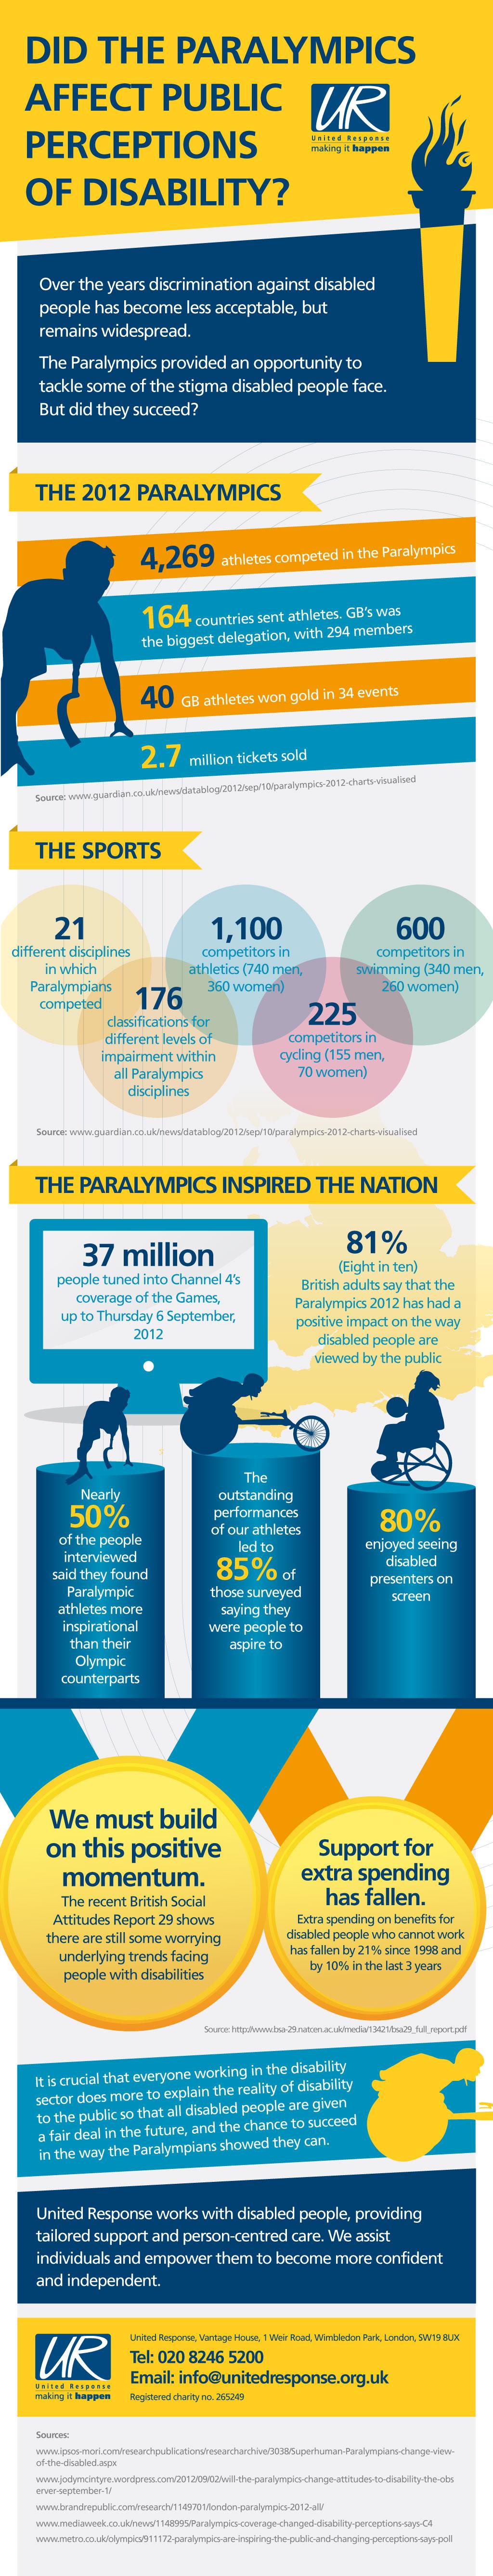 Paralympics Infographic_V4_2